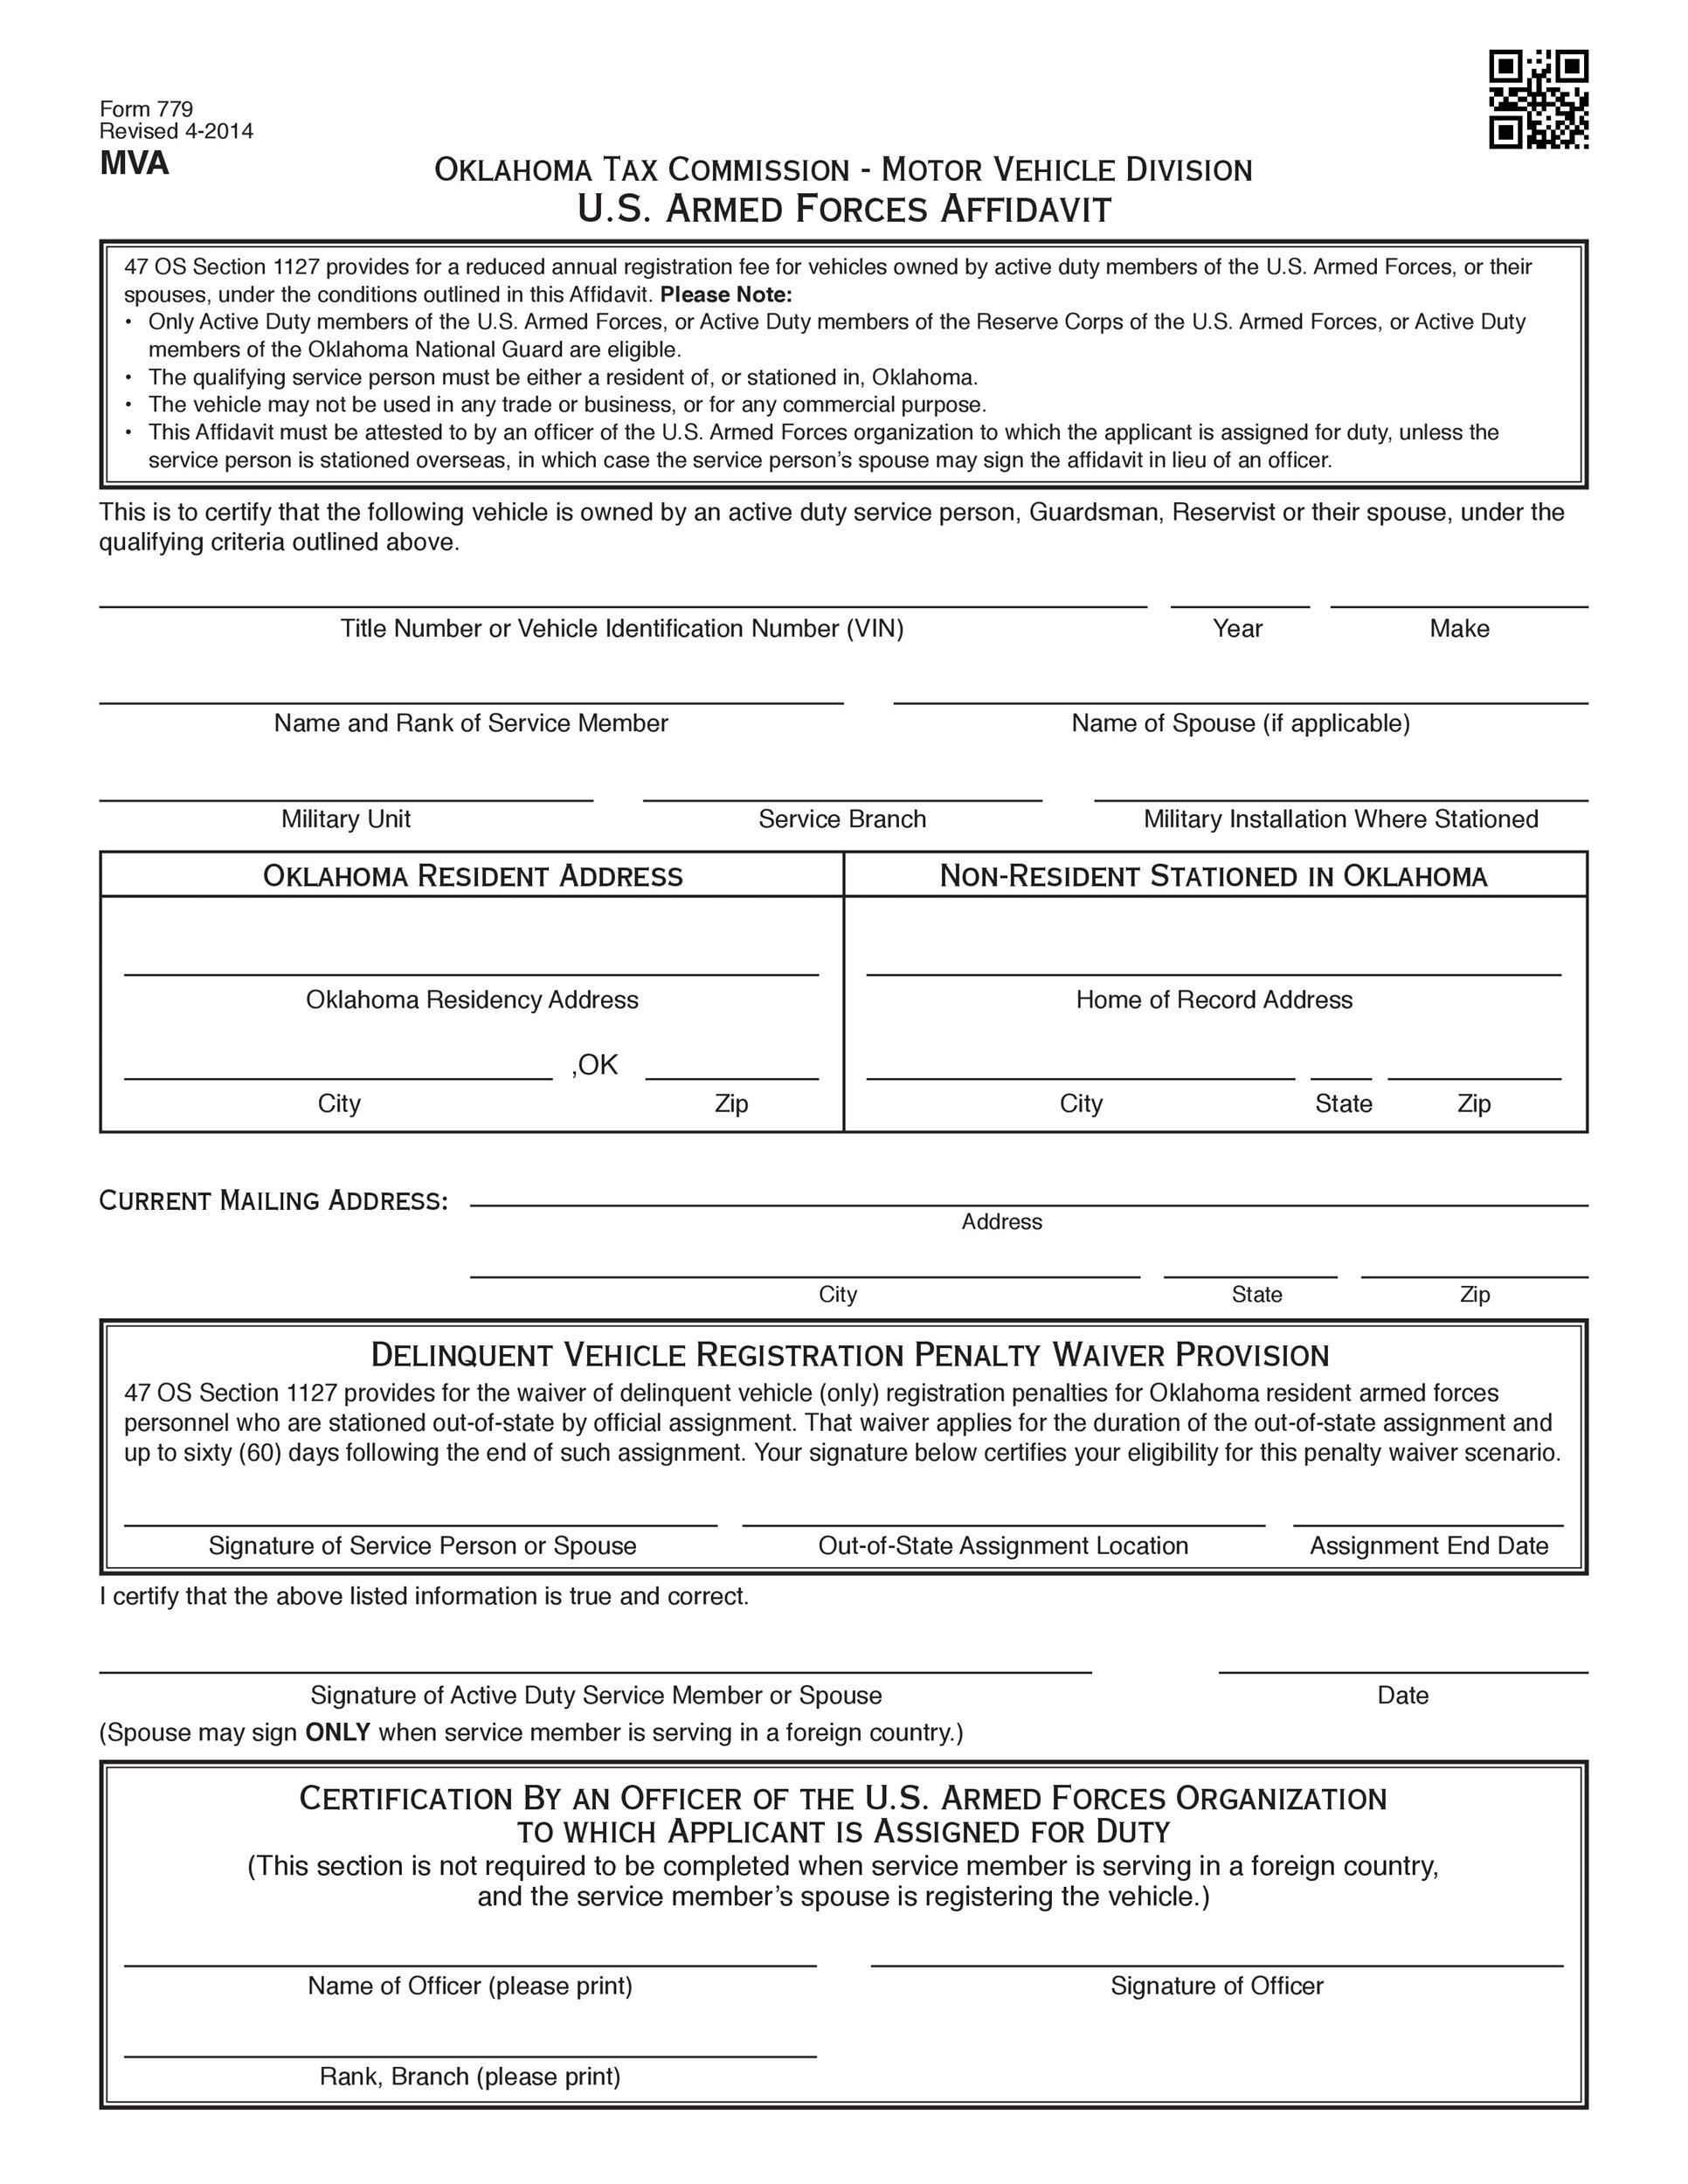 Free affidavit form 02